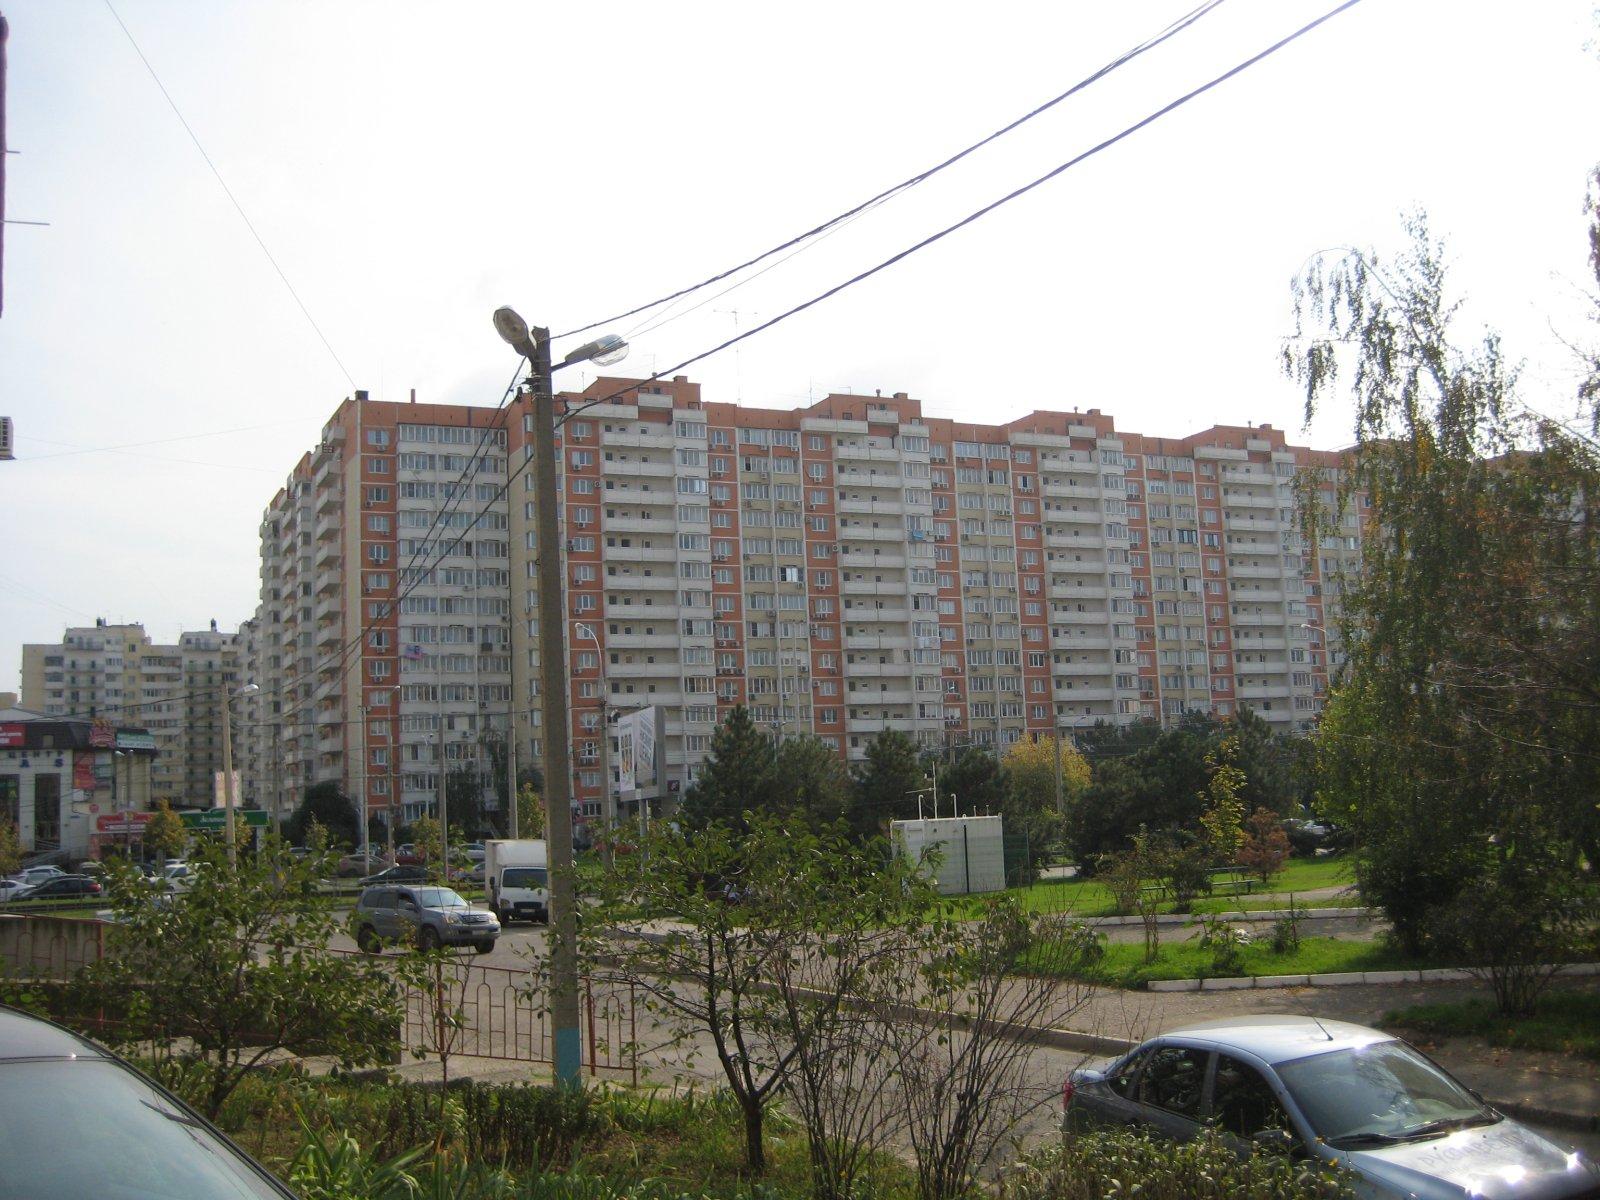 схема улицы чекистов 33 на юбилейном краснодар